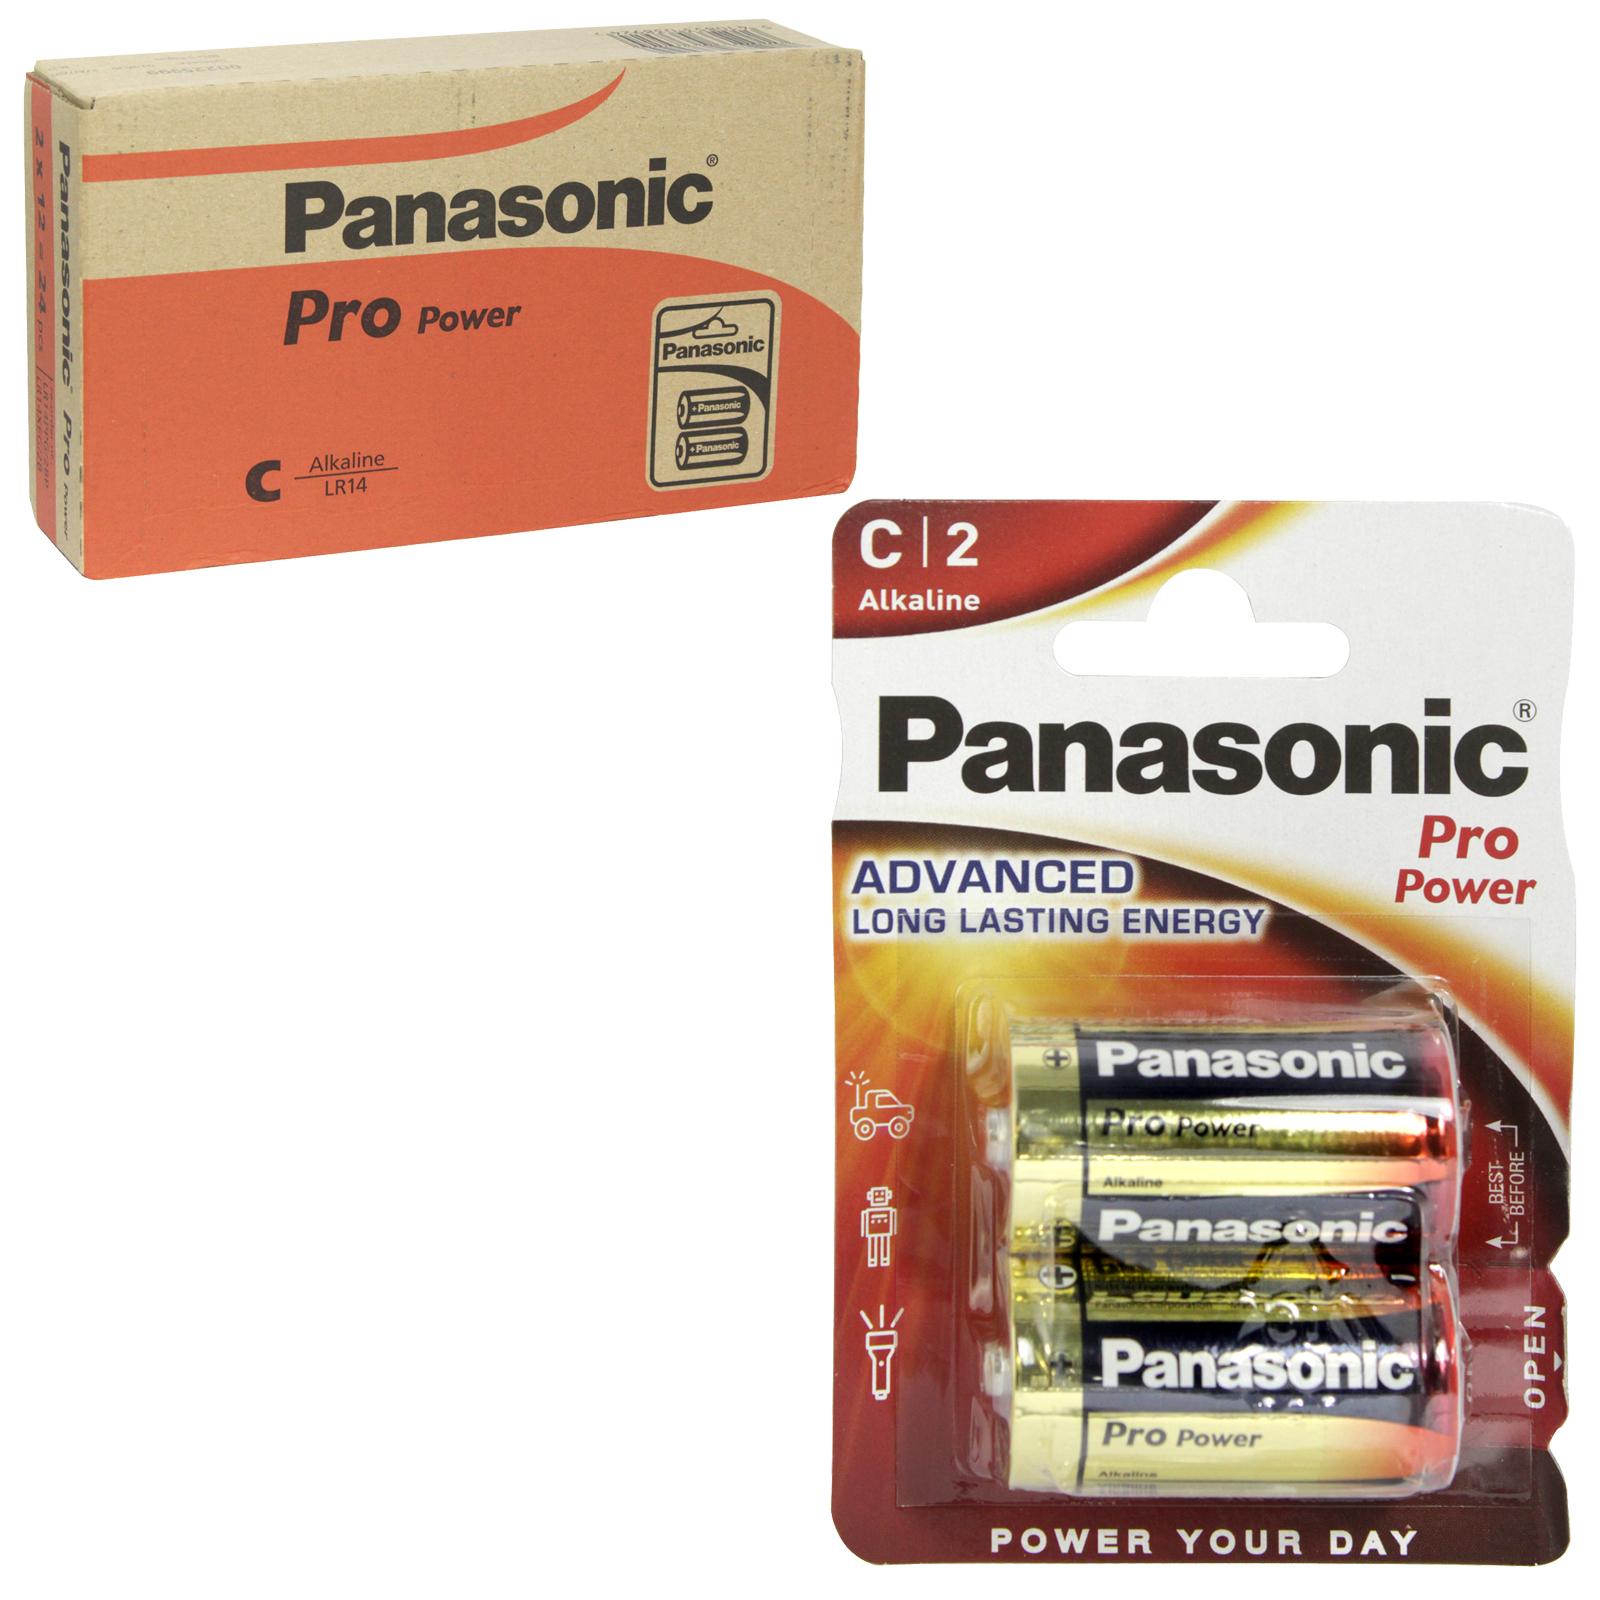 PANASONIC BATTERIES PRO POWER LR14 2PK C X12